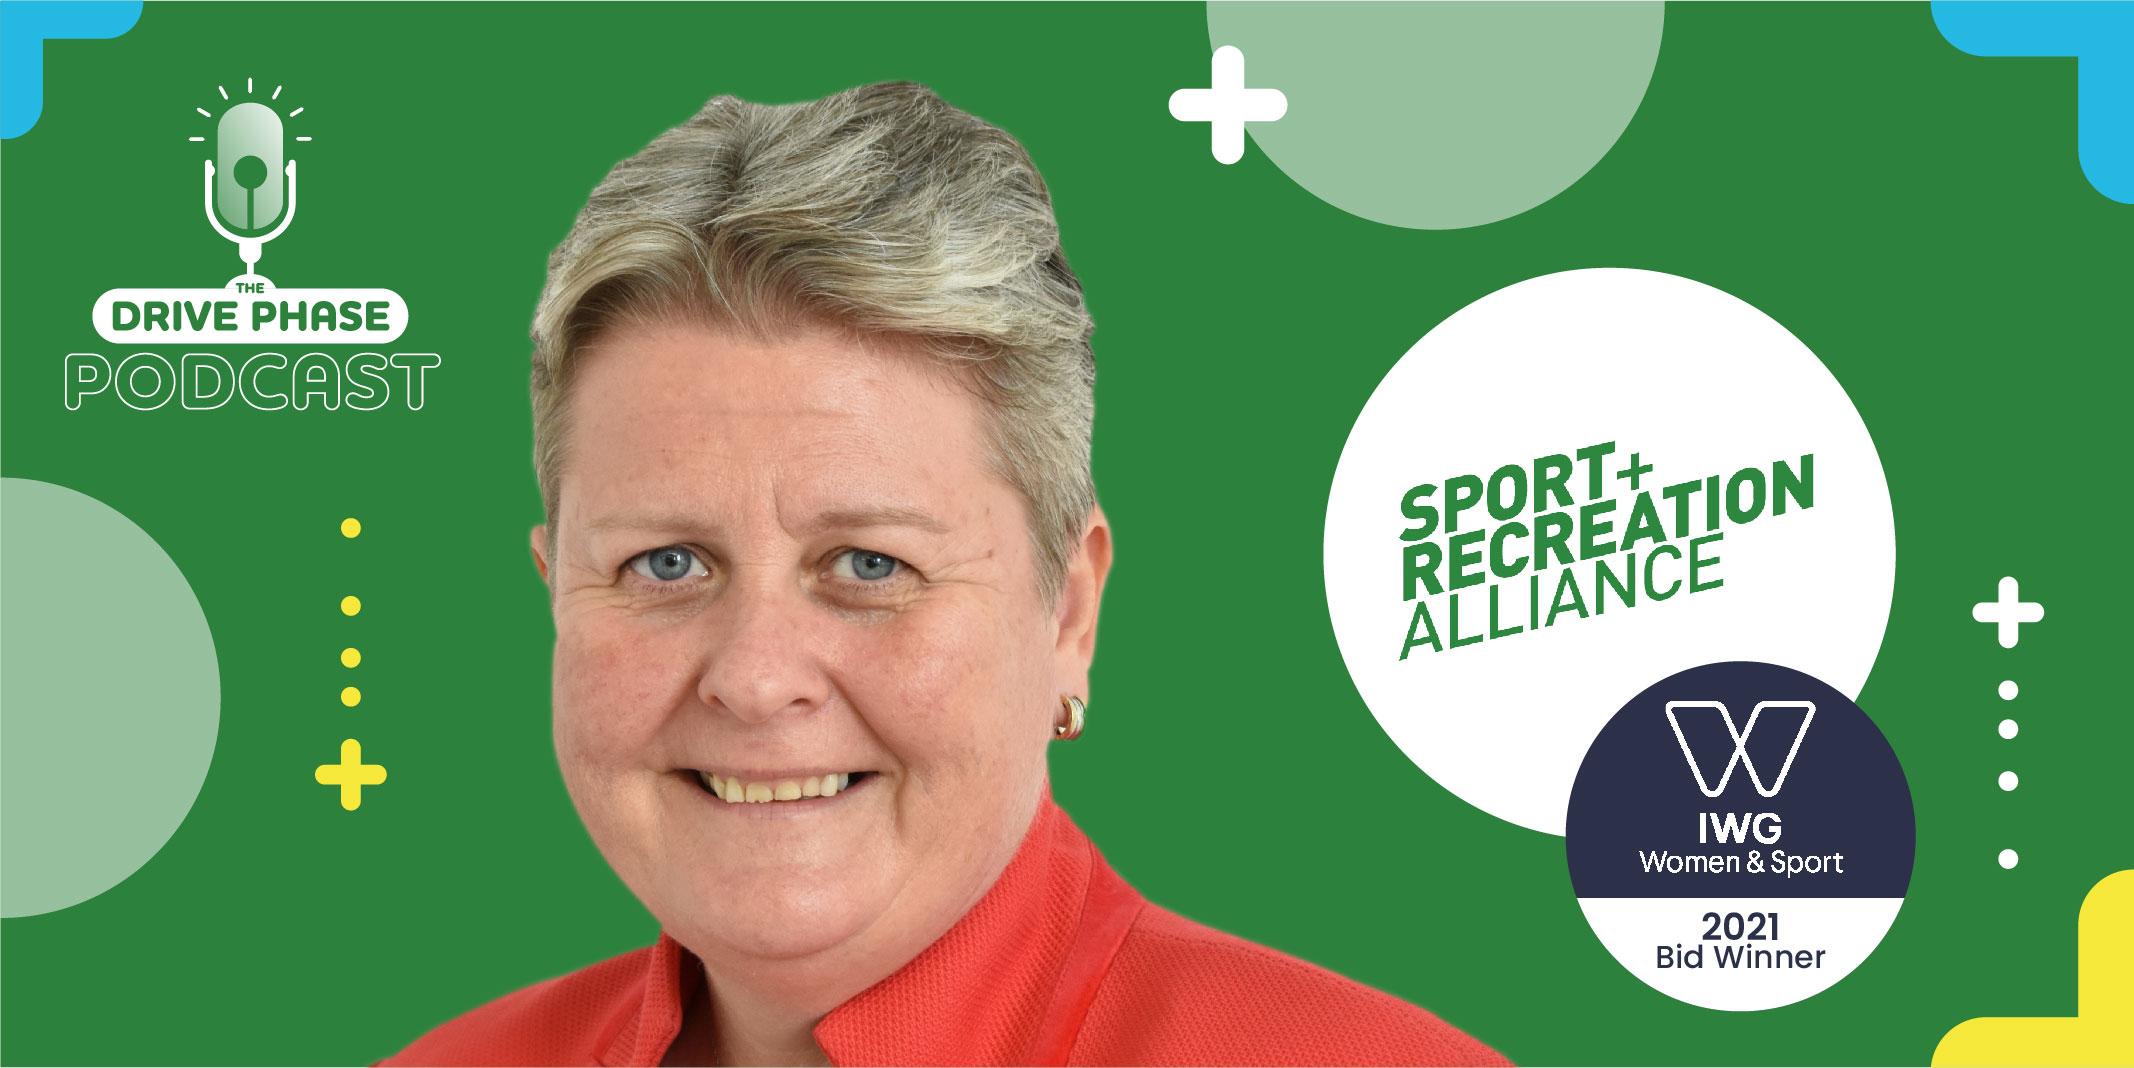 Sport & Recreation Alliance